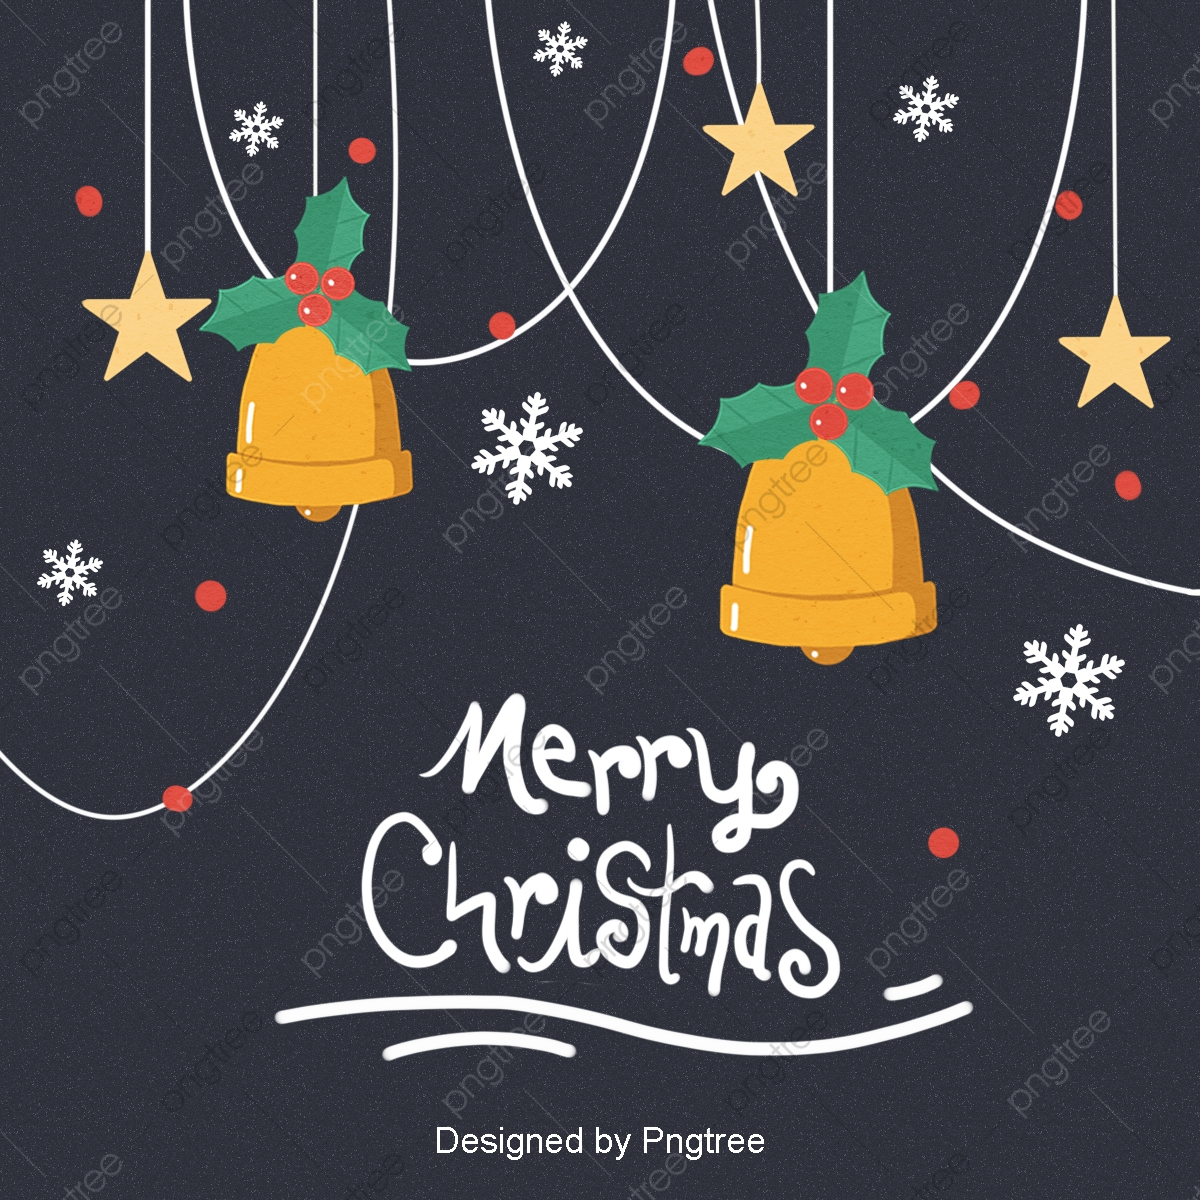 Simple Cute Cartoon Cute Christmas Card Background